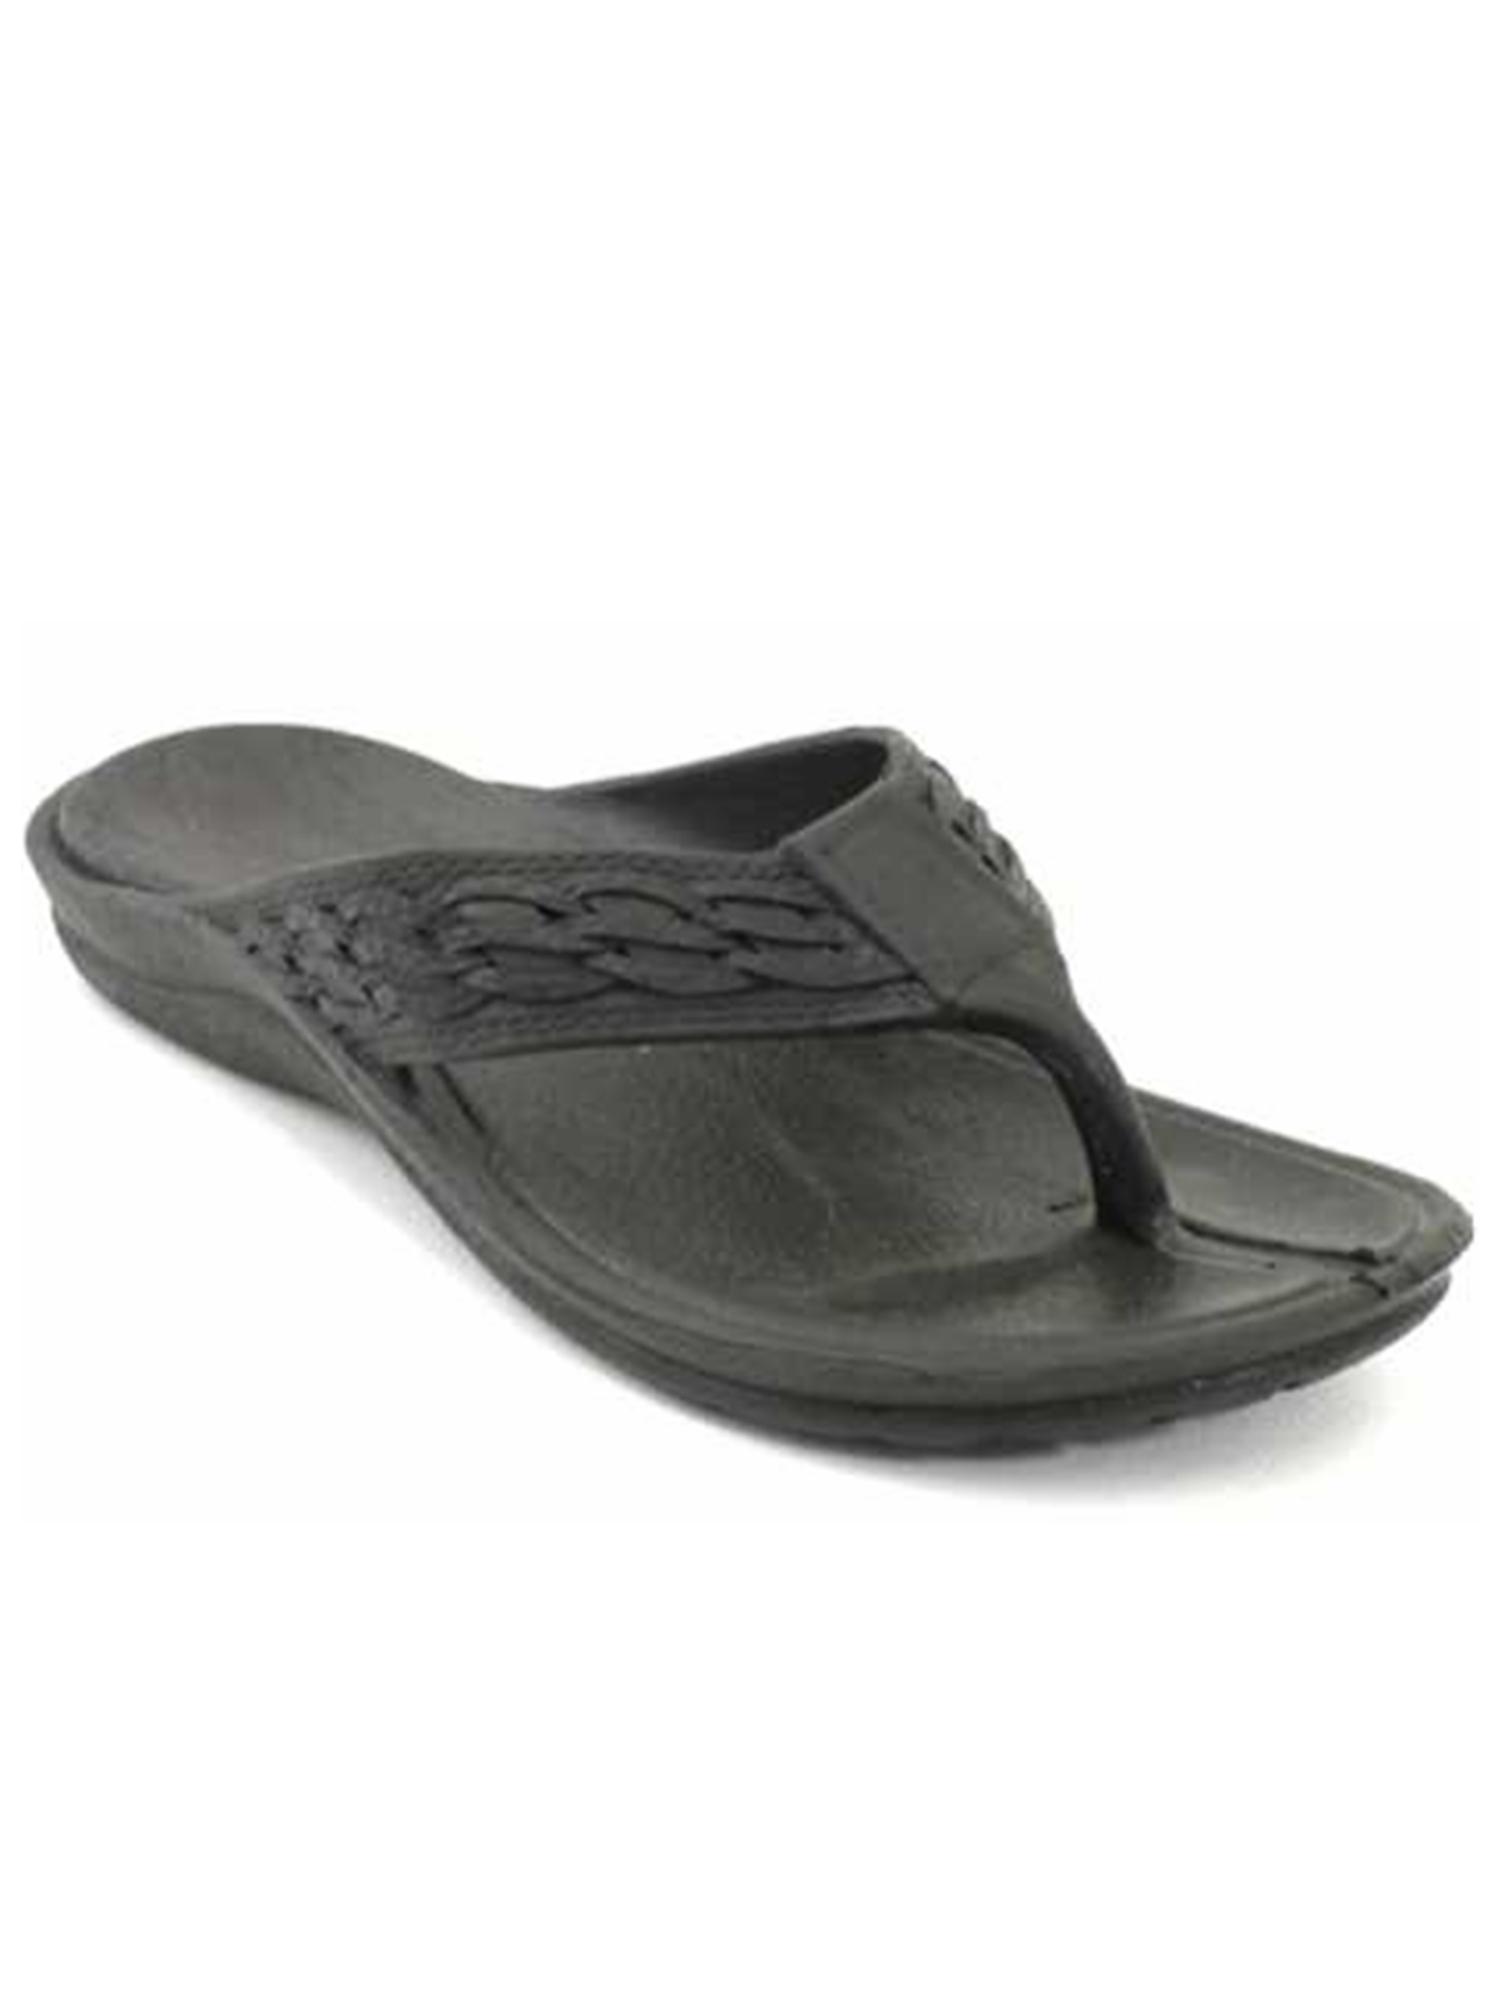 Pali Hawaii Unisex PH 198 Thong Sandal-Black-Size 10